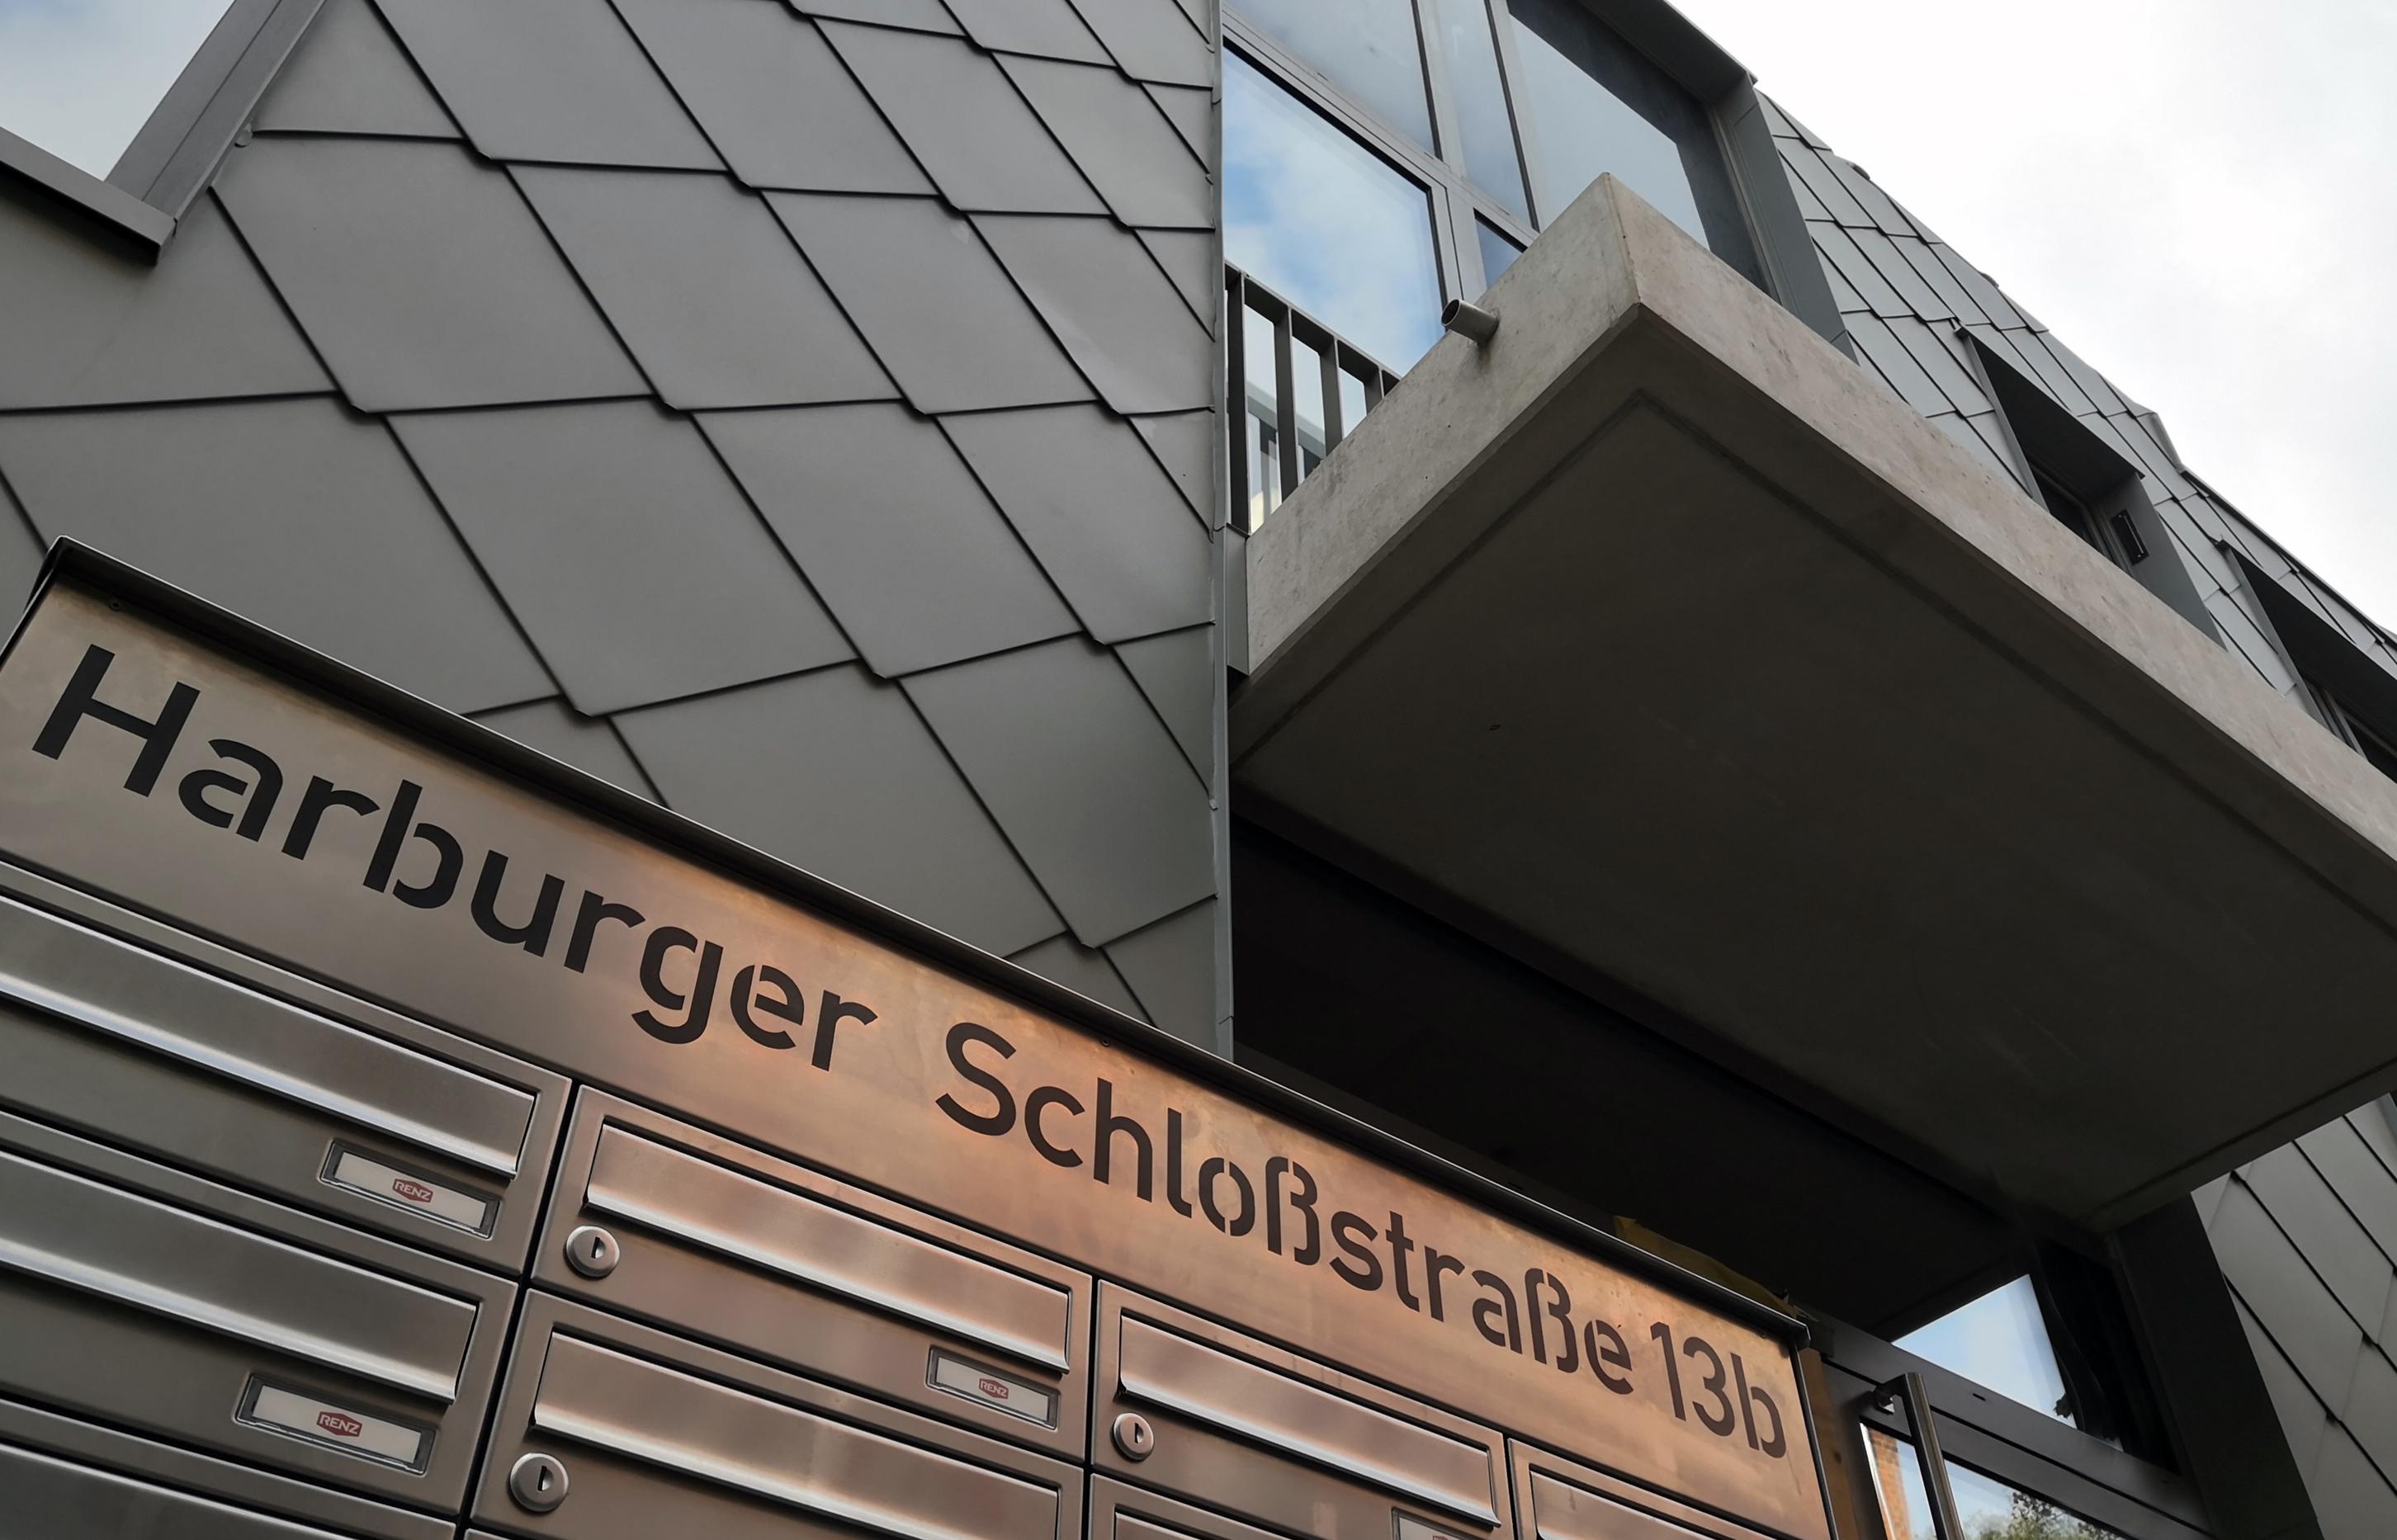 Harburger Schloßstraße 13 b